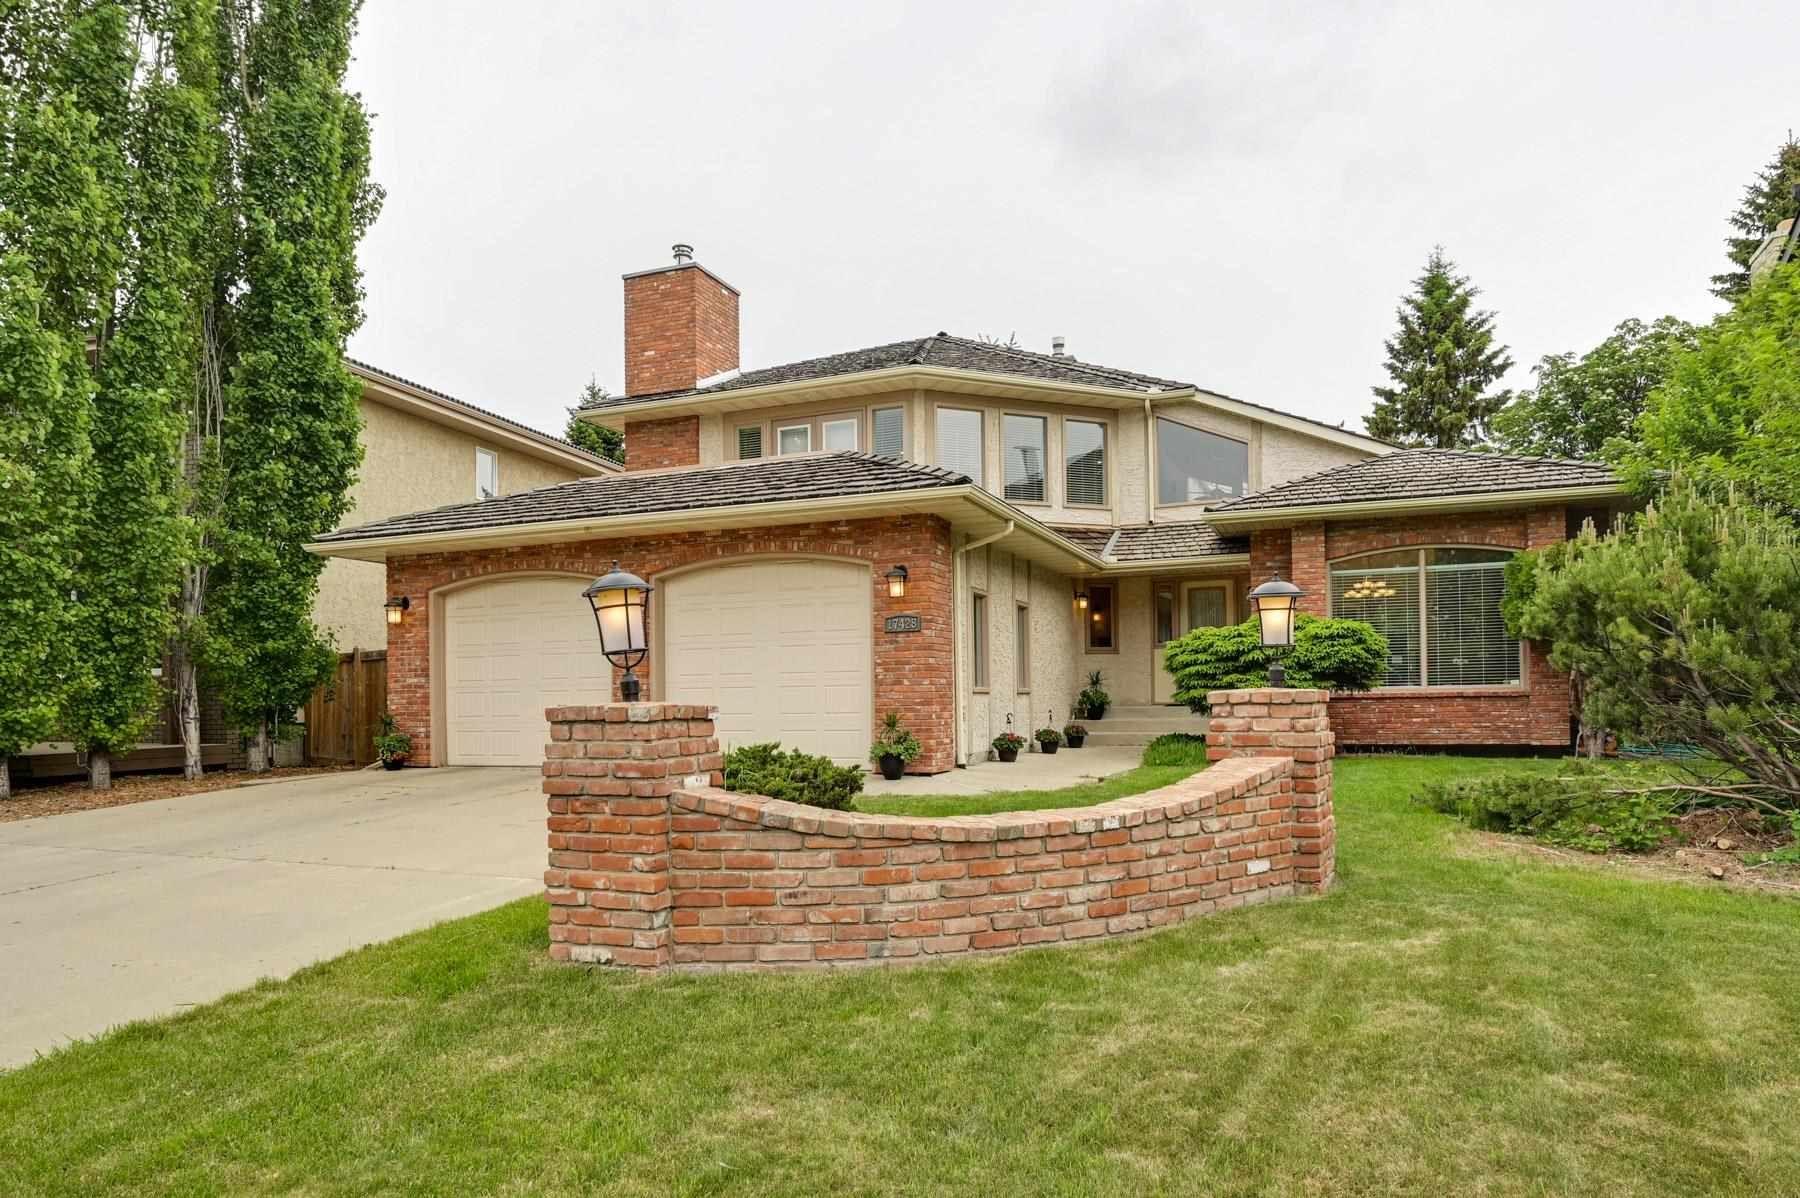 Main Photo: 17428 53 Avenue in Edmonton: Zone 20 House for sale : MLS®# E4248273